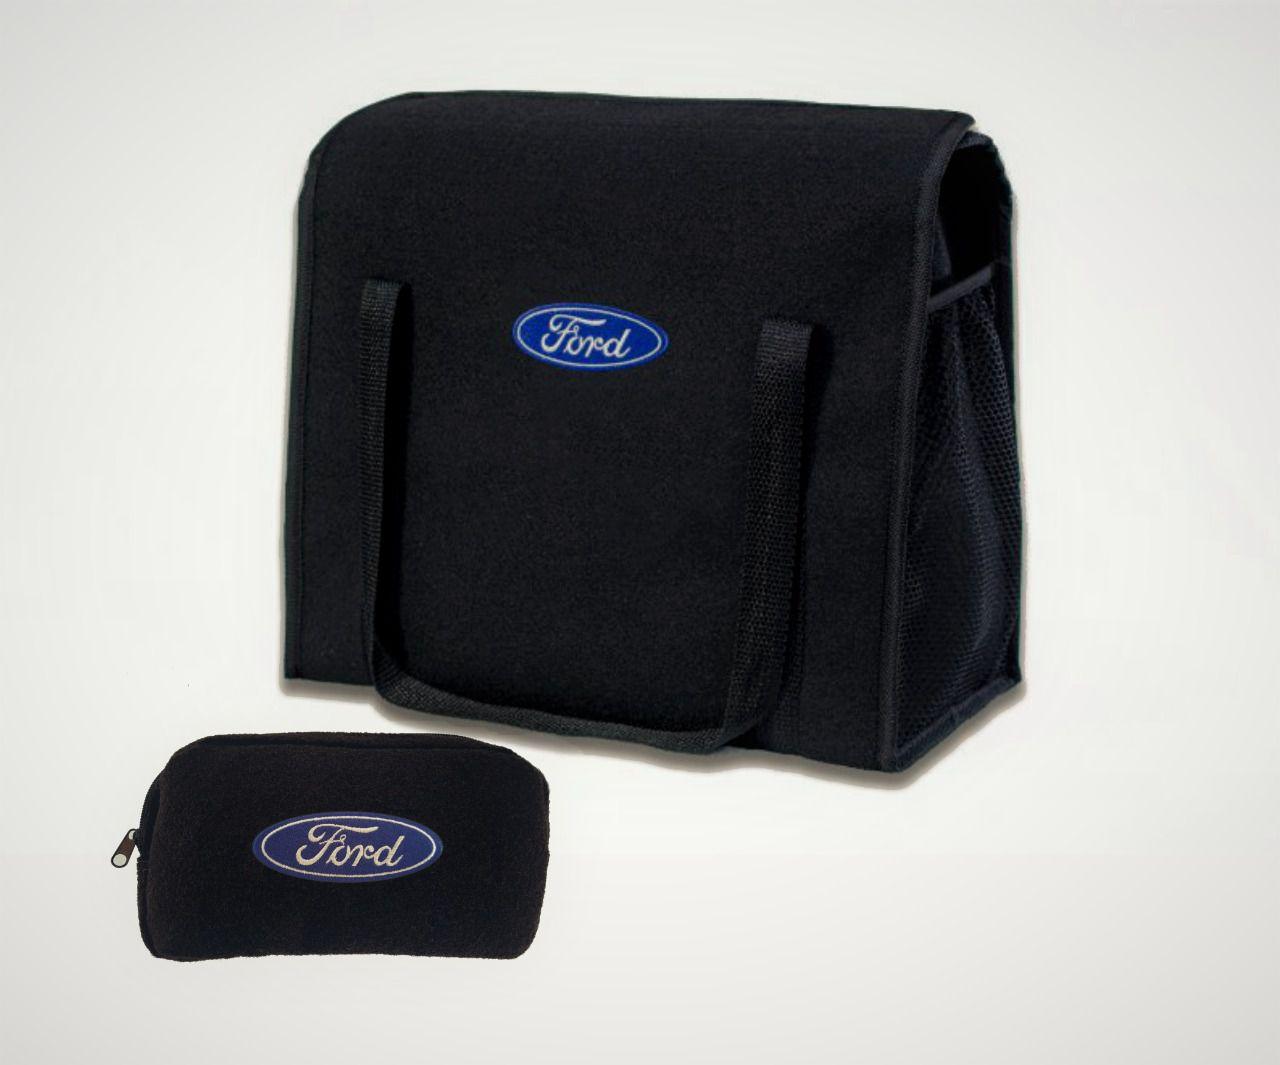 Kit Bolsa Organizadora Porta Malas e Necessaire Porta Luvas Ford